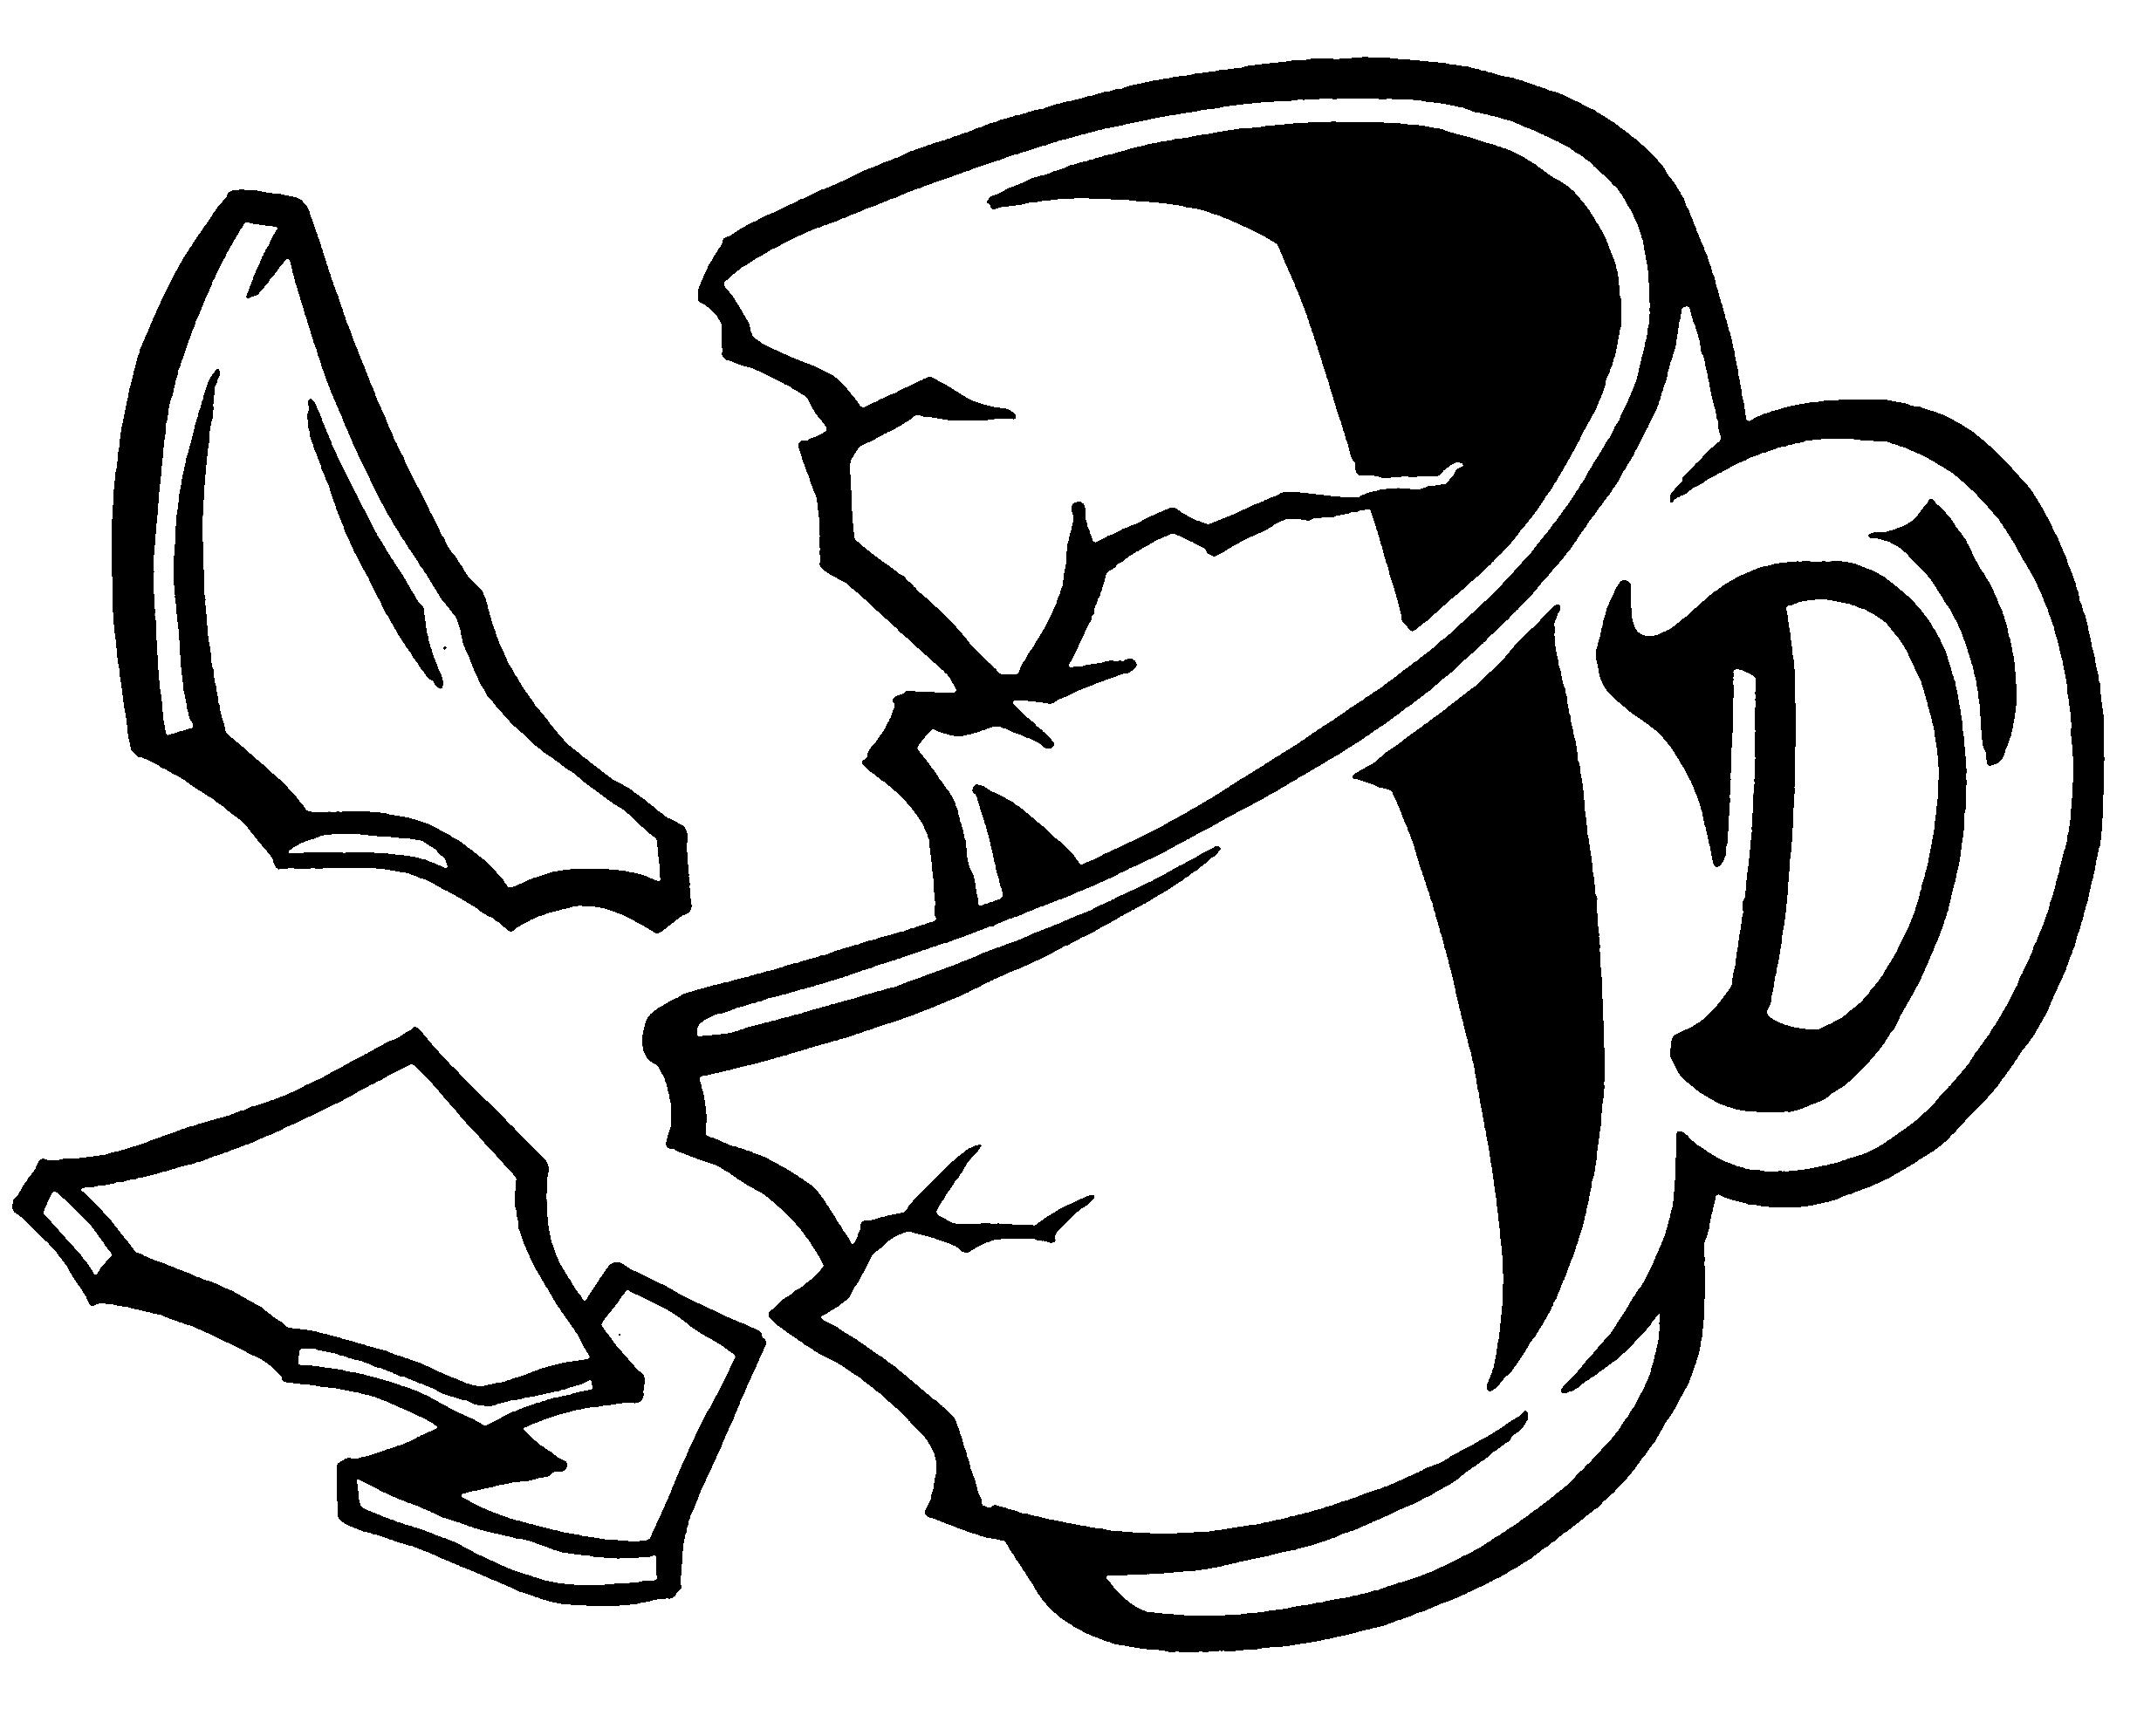 Free Broken Cups Download Free Clip Art Free Clip Art On